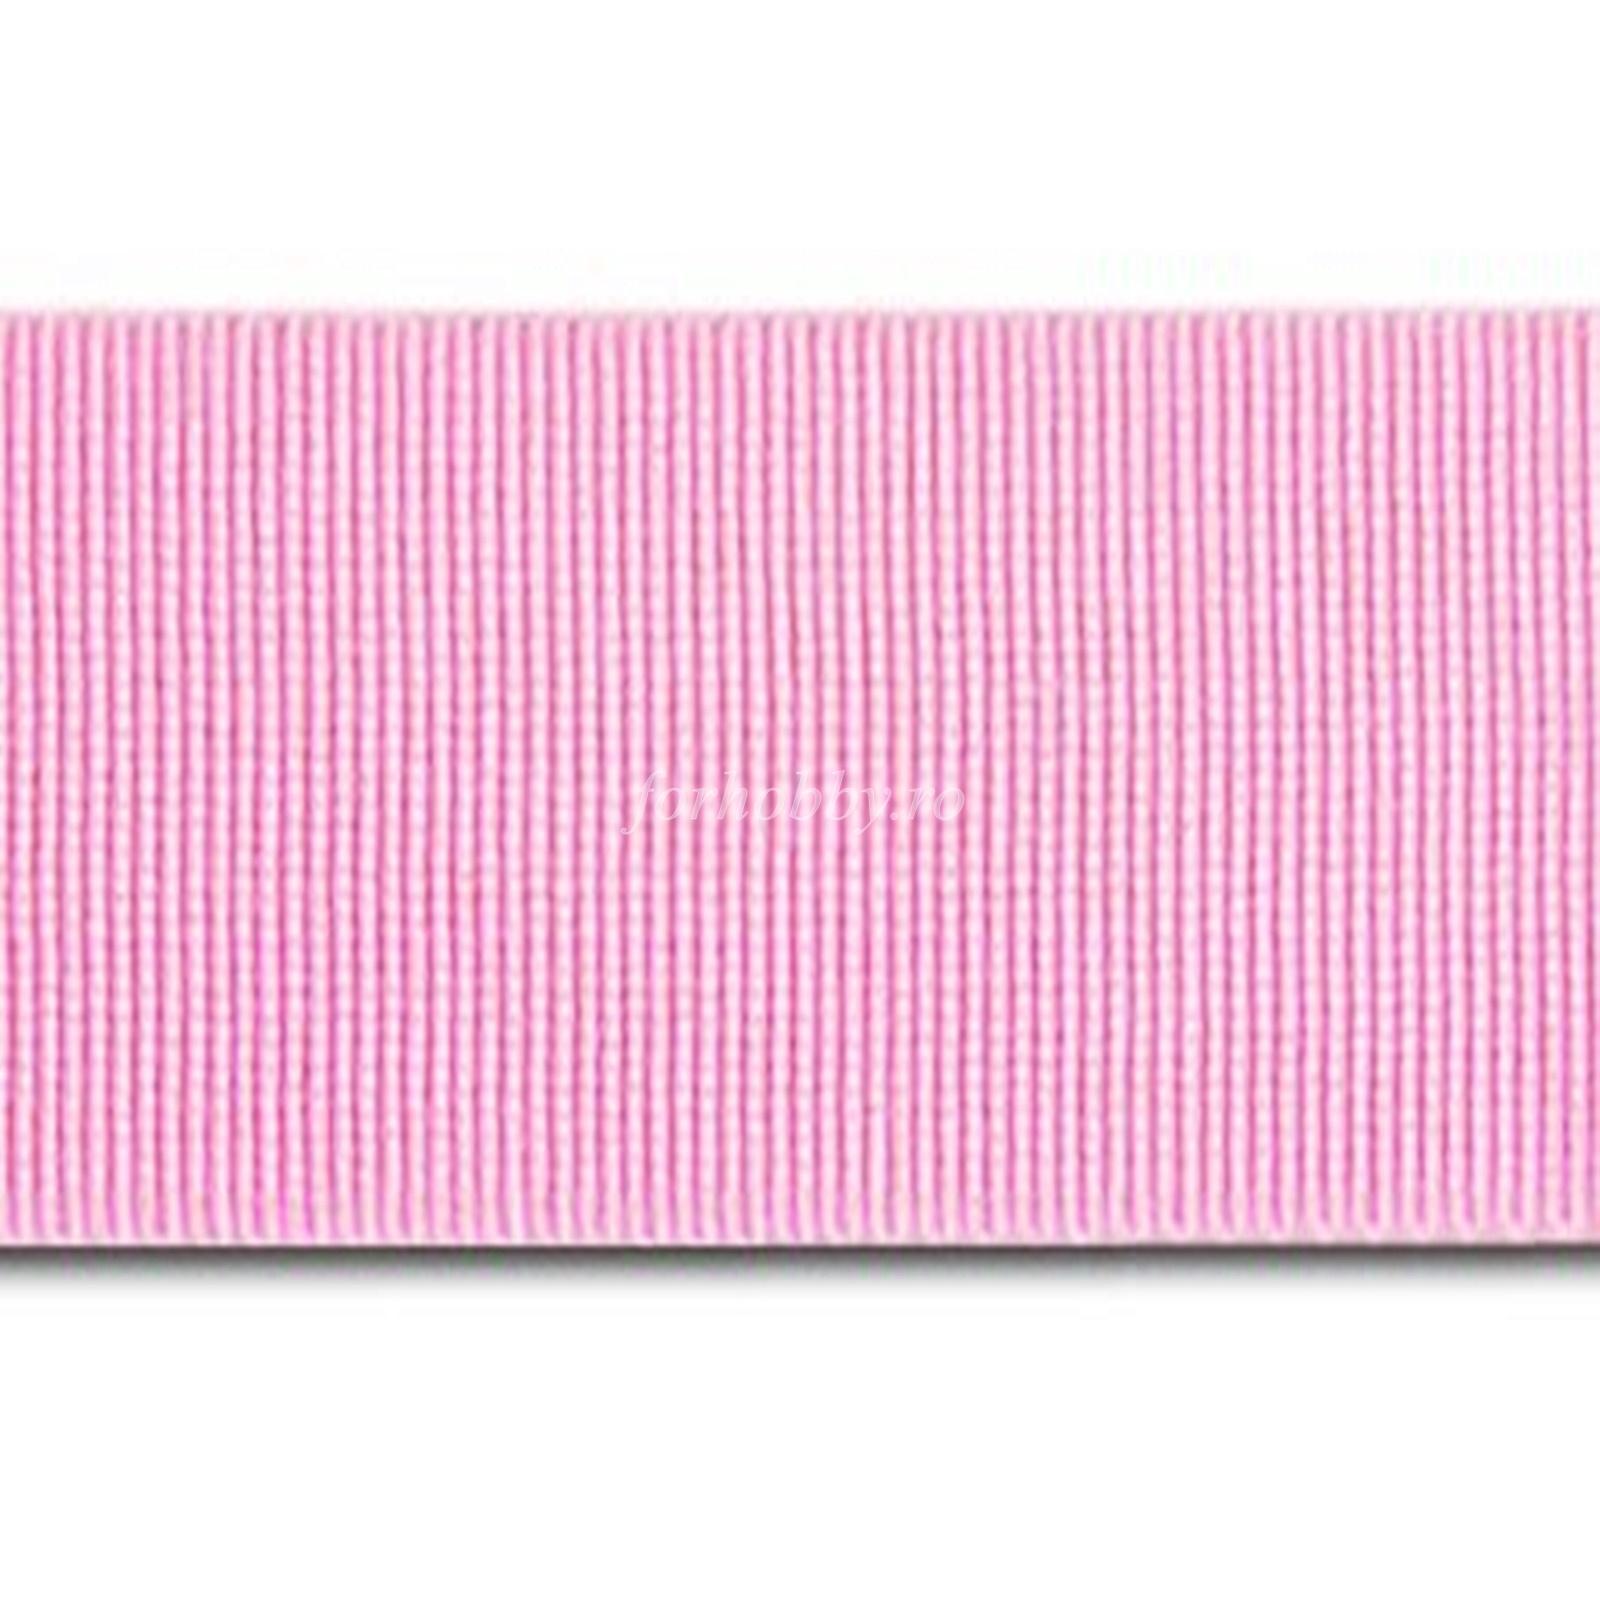 rips pink deshis